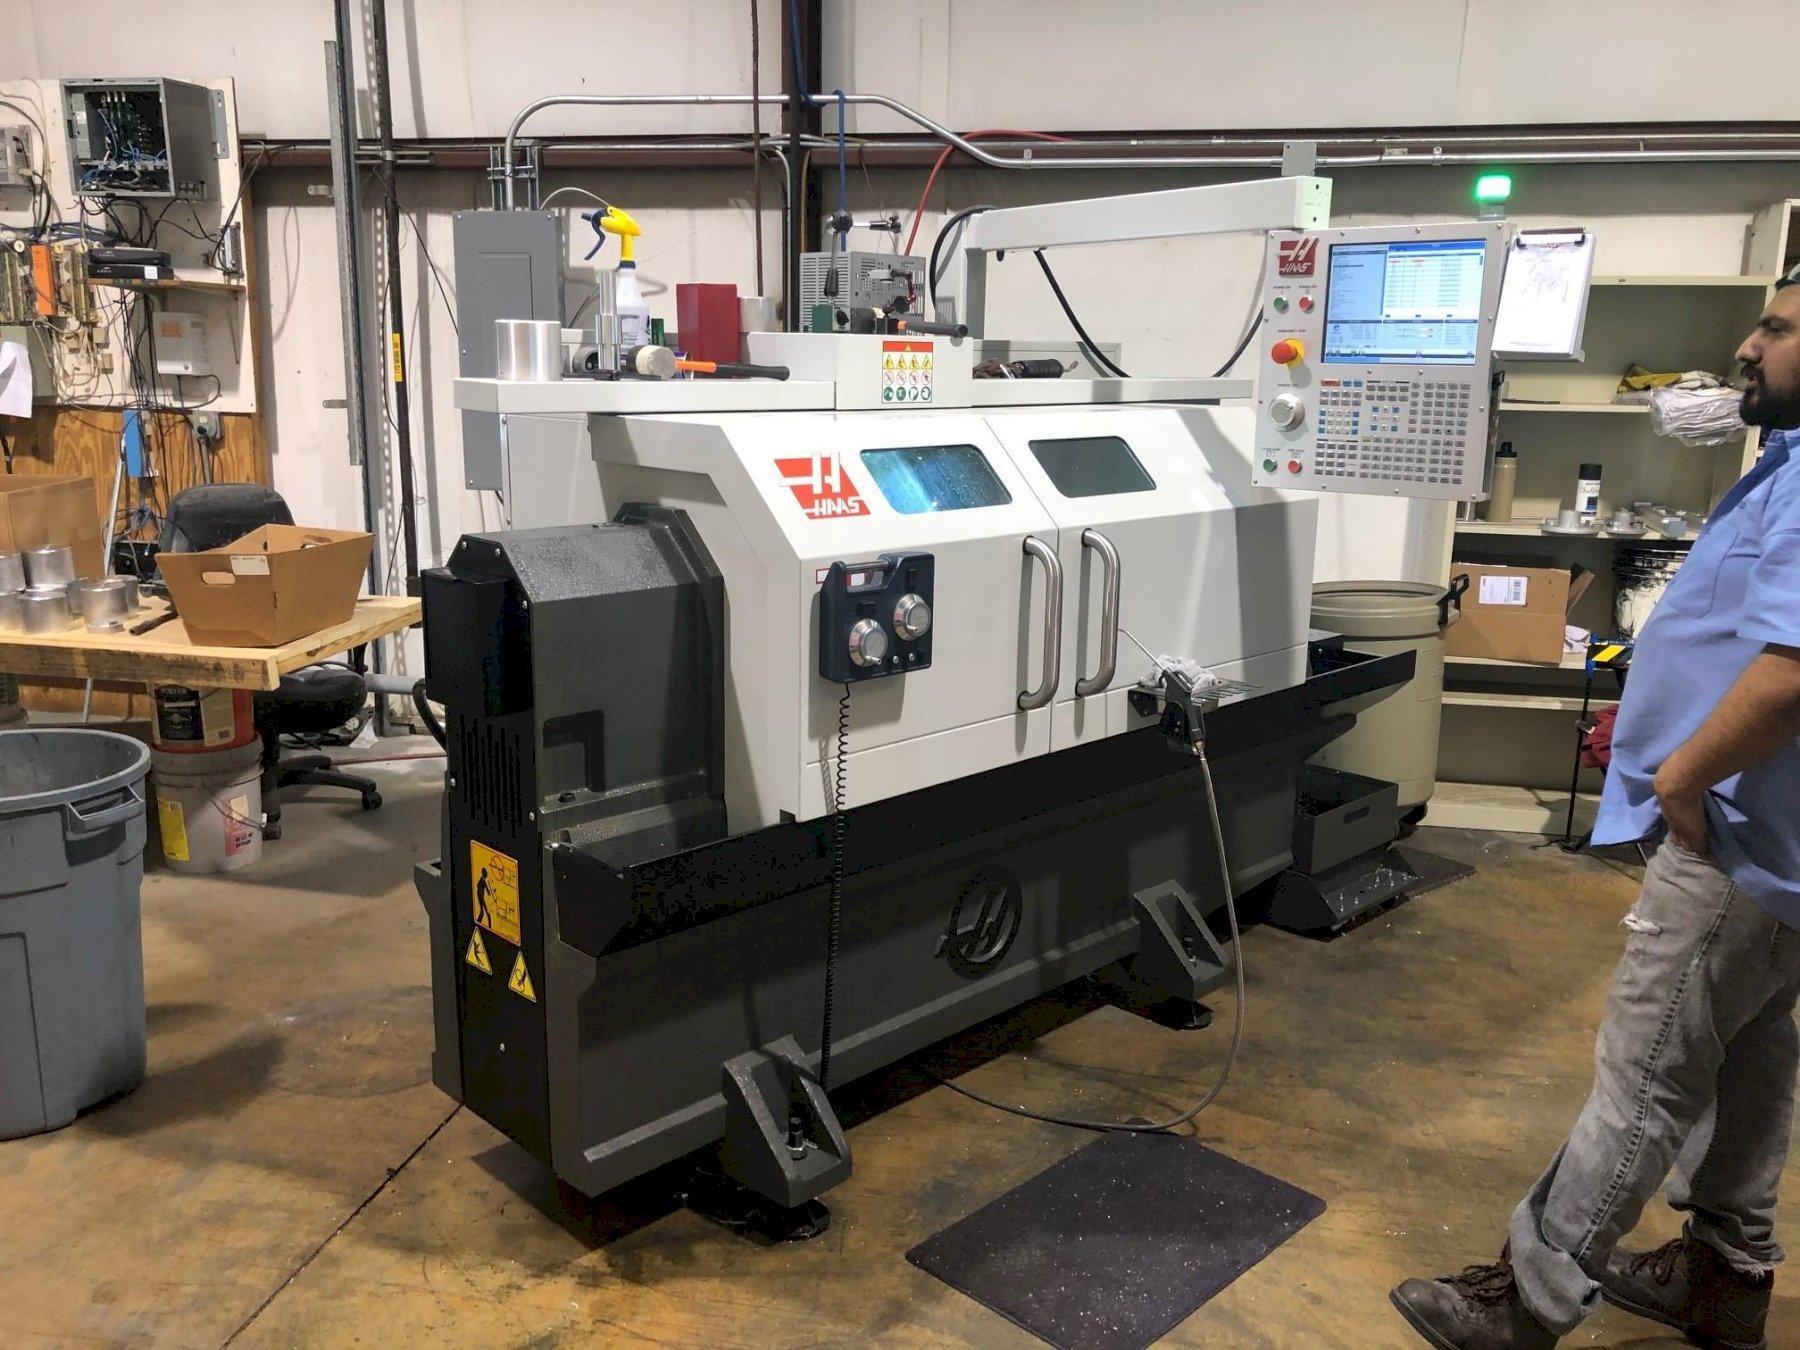 2020 Haas TL-2 Toolroom Lathe